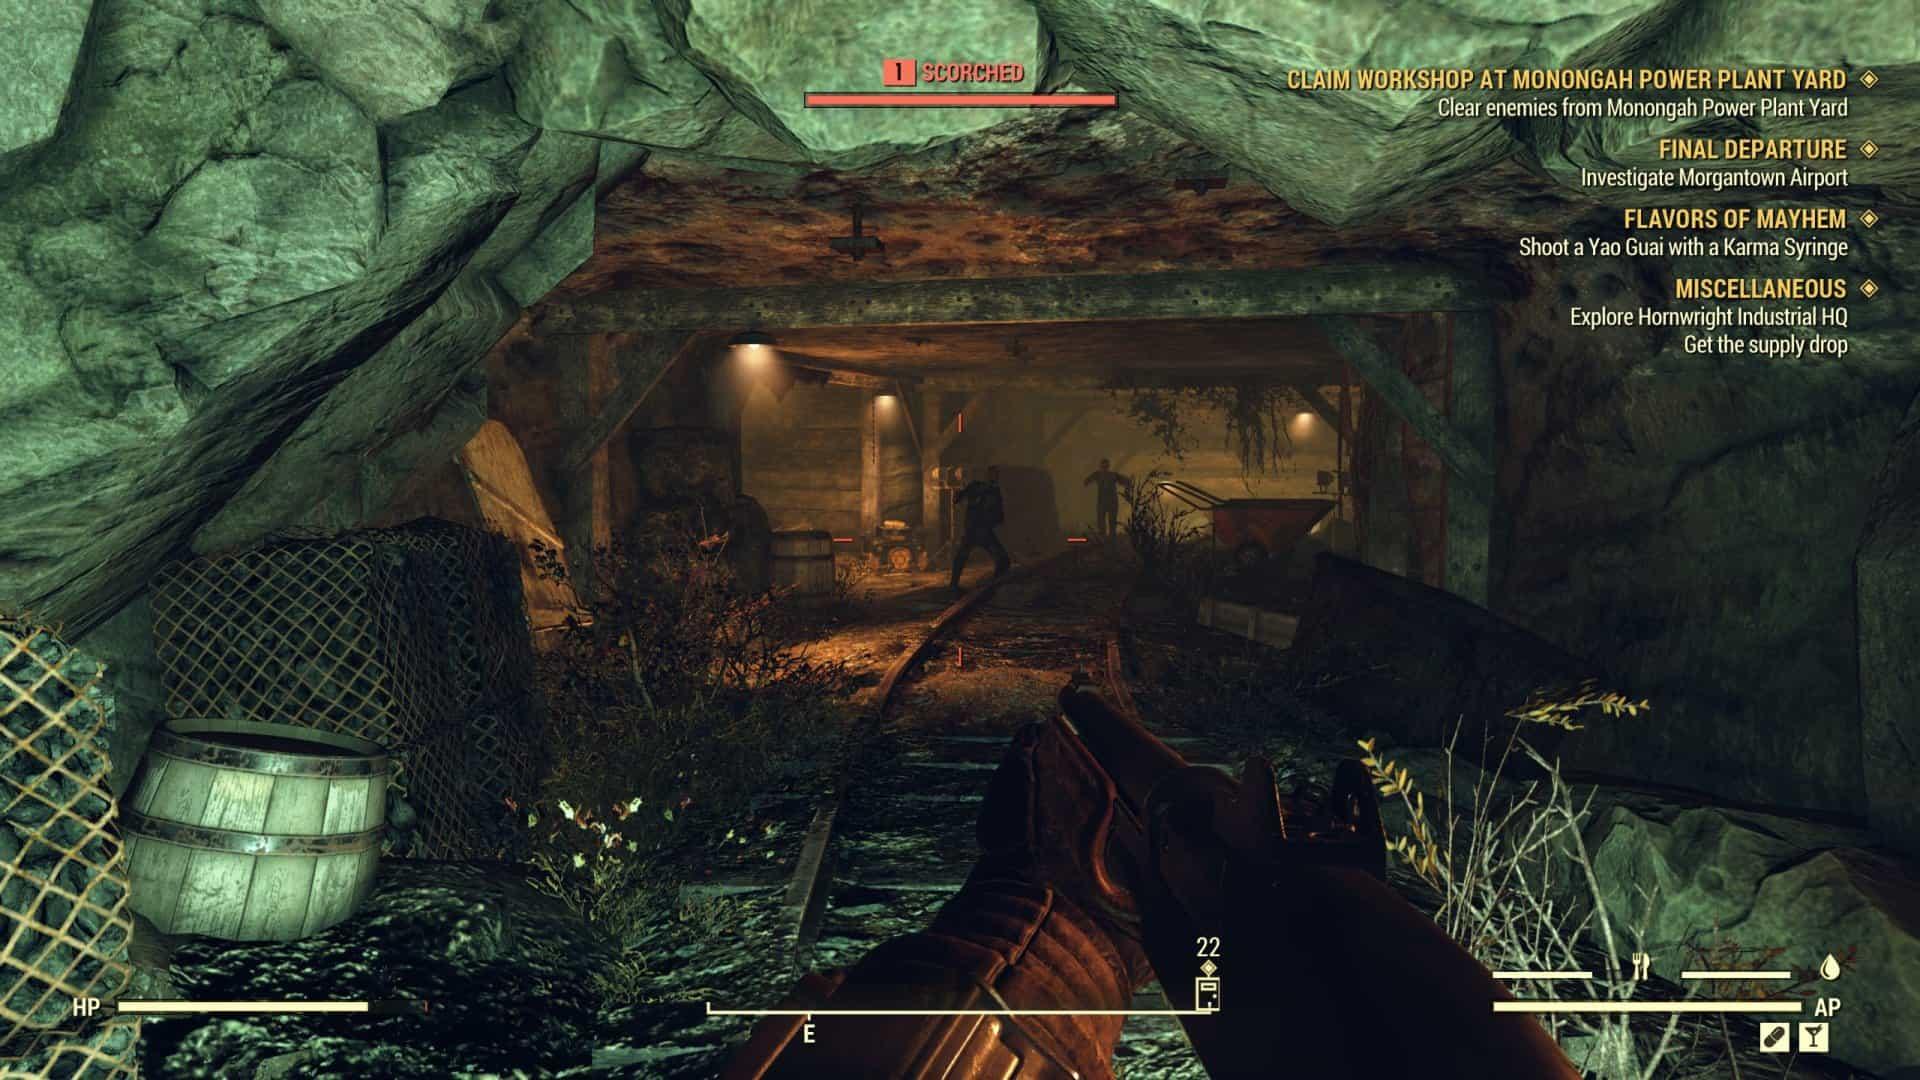 Fallout 76 Download Free PC Game Latest Version - Gaming Debates